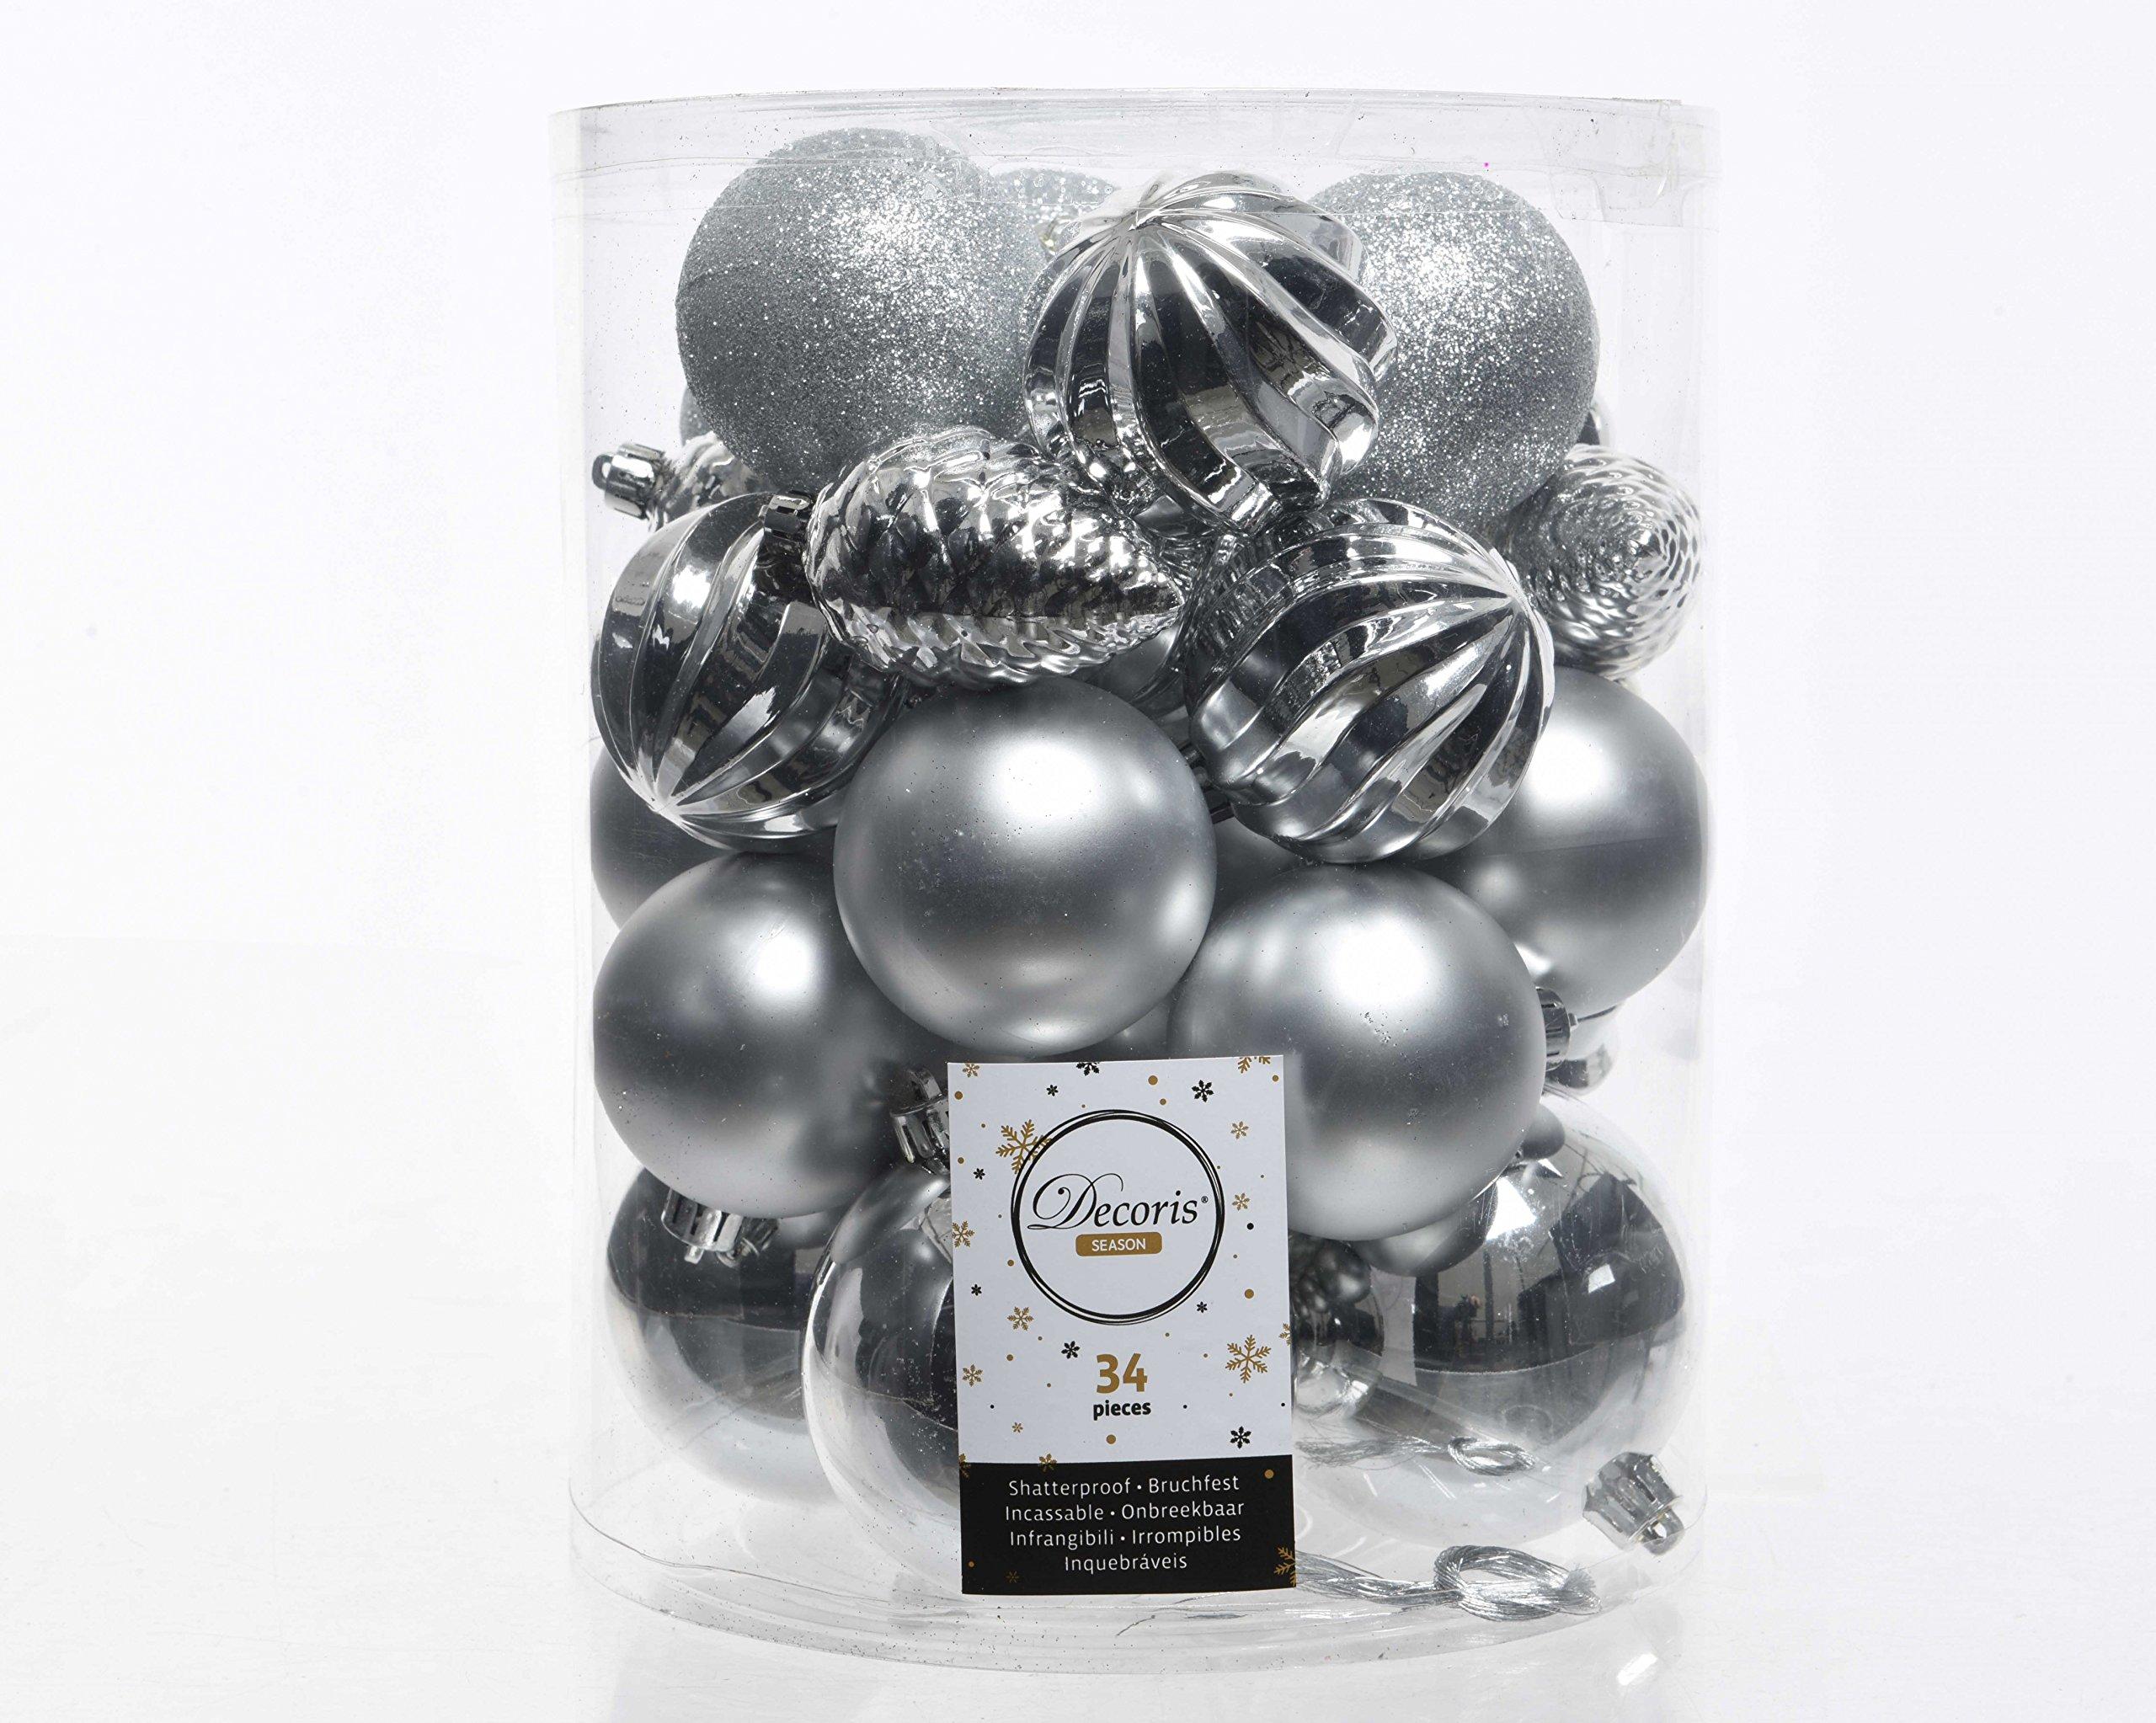 34er-Set-Kugelmix-PVC-mit-Weihnachtskugeln-Baumschmuck-bruchfest-Christbaumschmuck-Deko